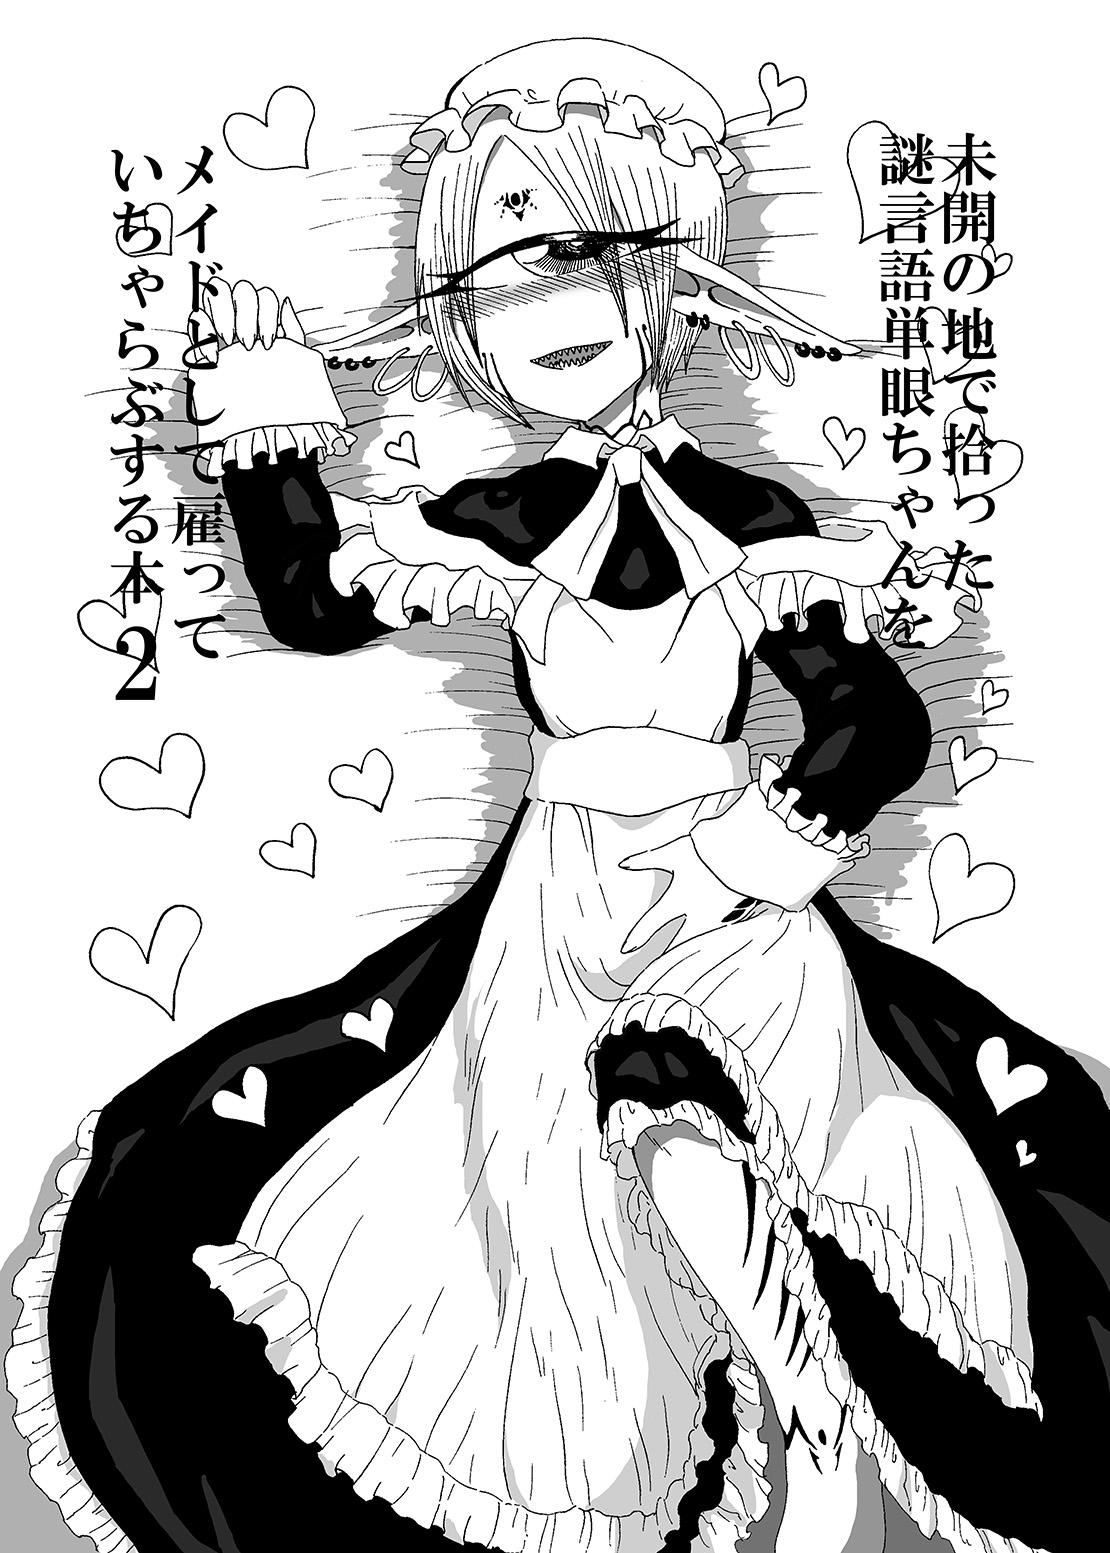 I made a gibberish speaking cyclops girl my maid 2 1